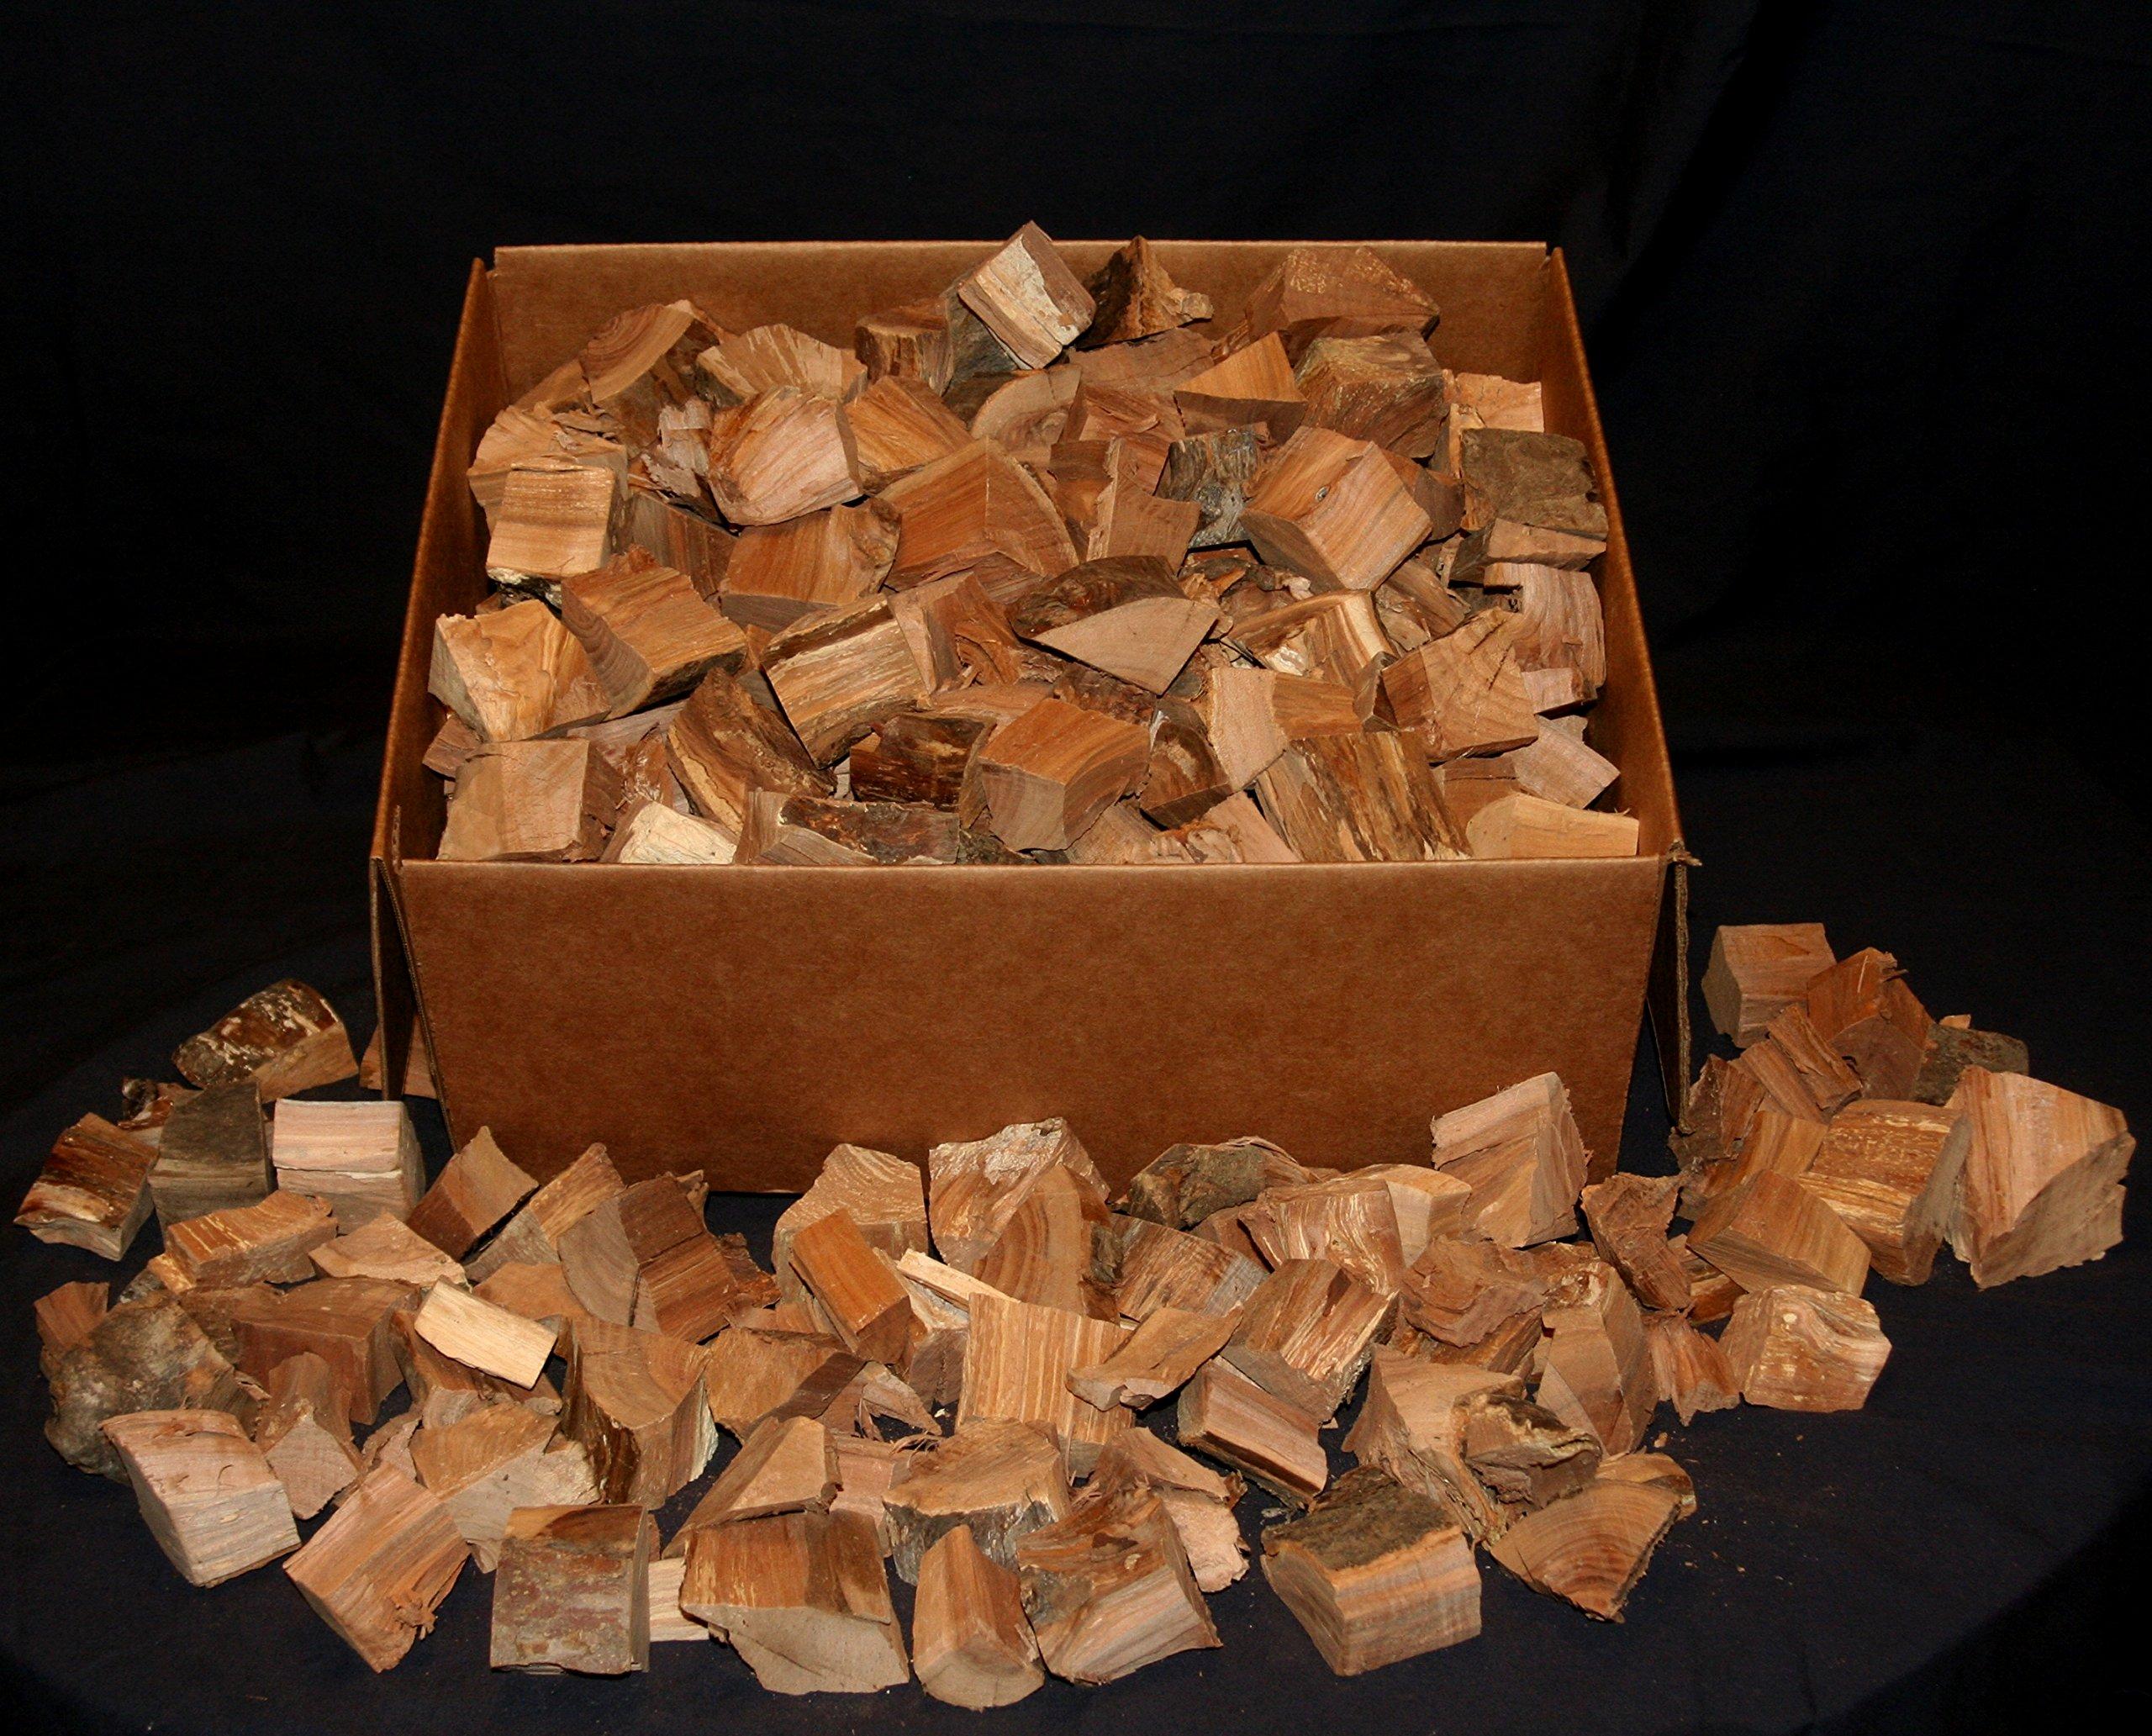 J.C.'s Smoking Wood Chunks - 19#'s/1500 Cu in of Bulk Chunks - Oak by J.C.'s Smoking Wood Products